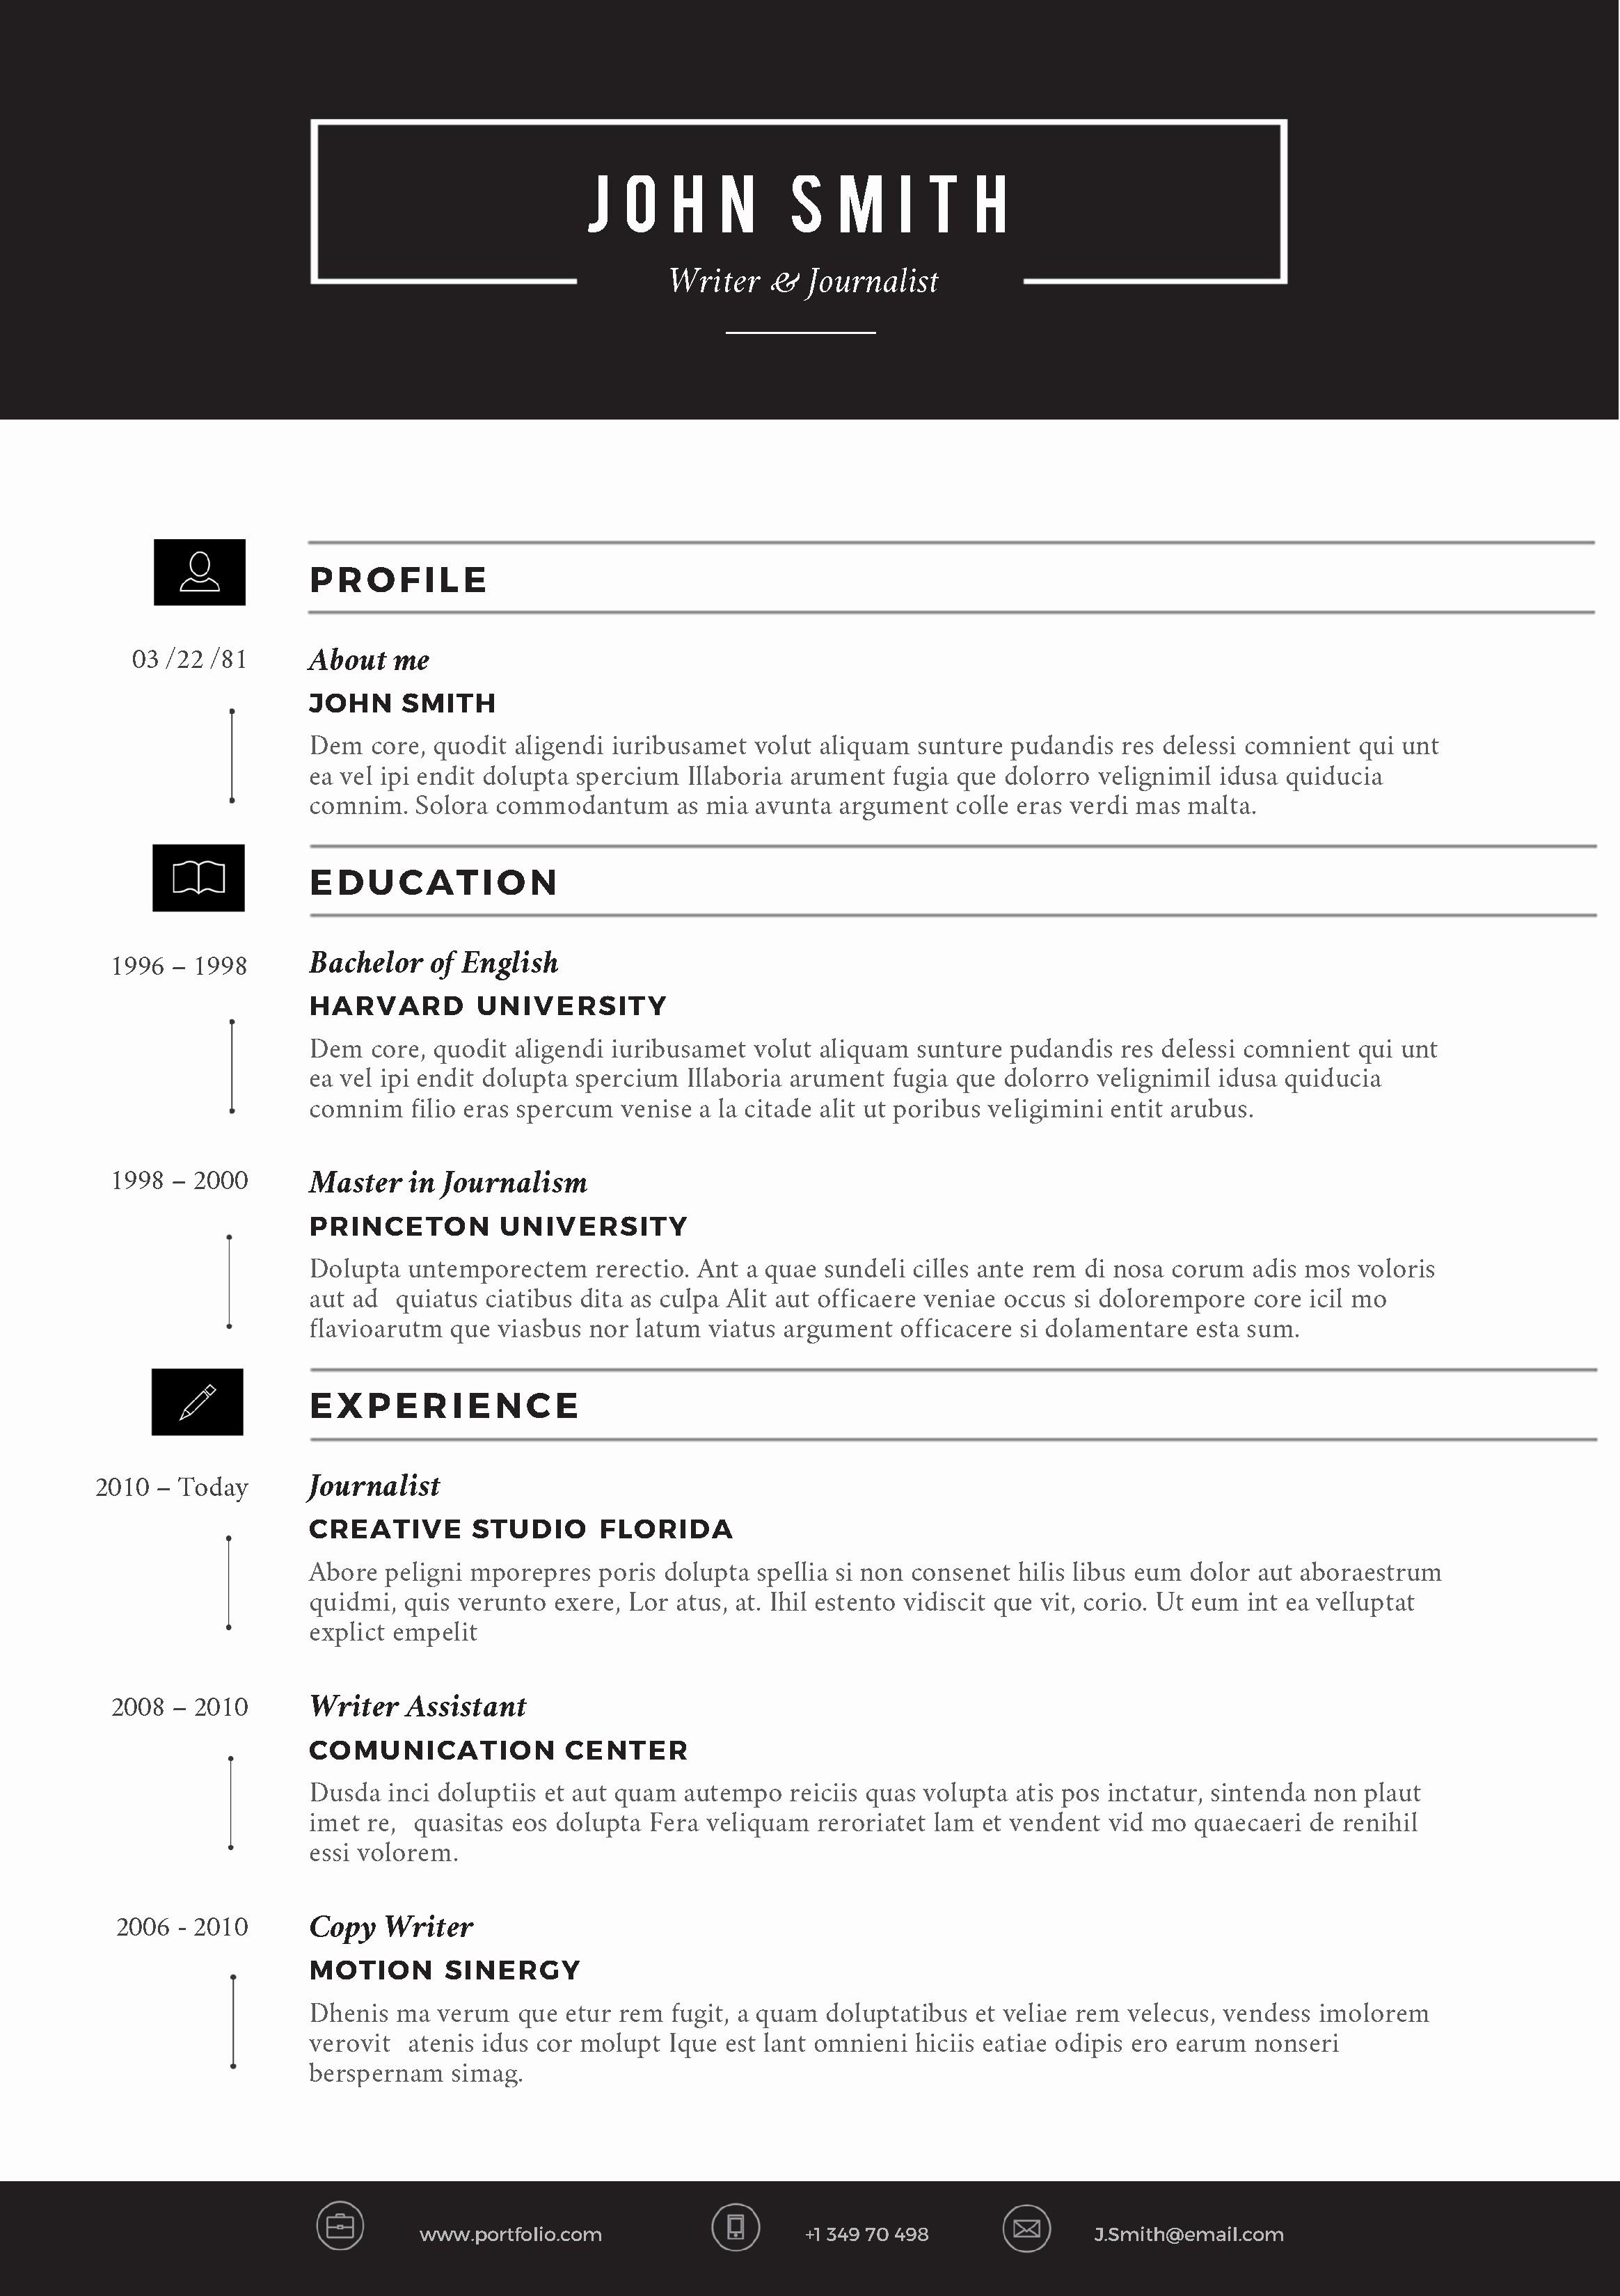 Resume format In Microsoft Word Beautiful Cvfolio Best 10 Resume Templates for Microsoft Word